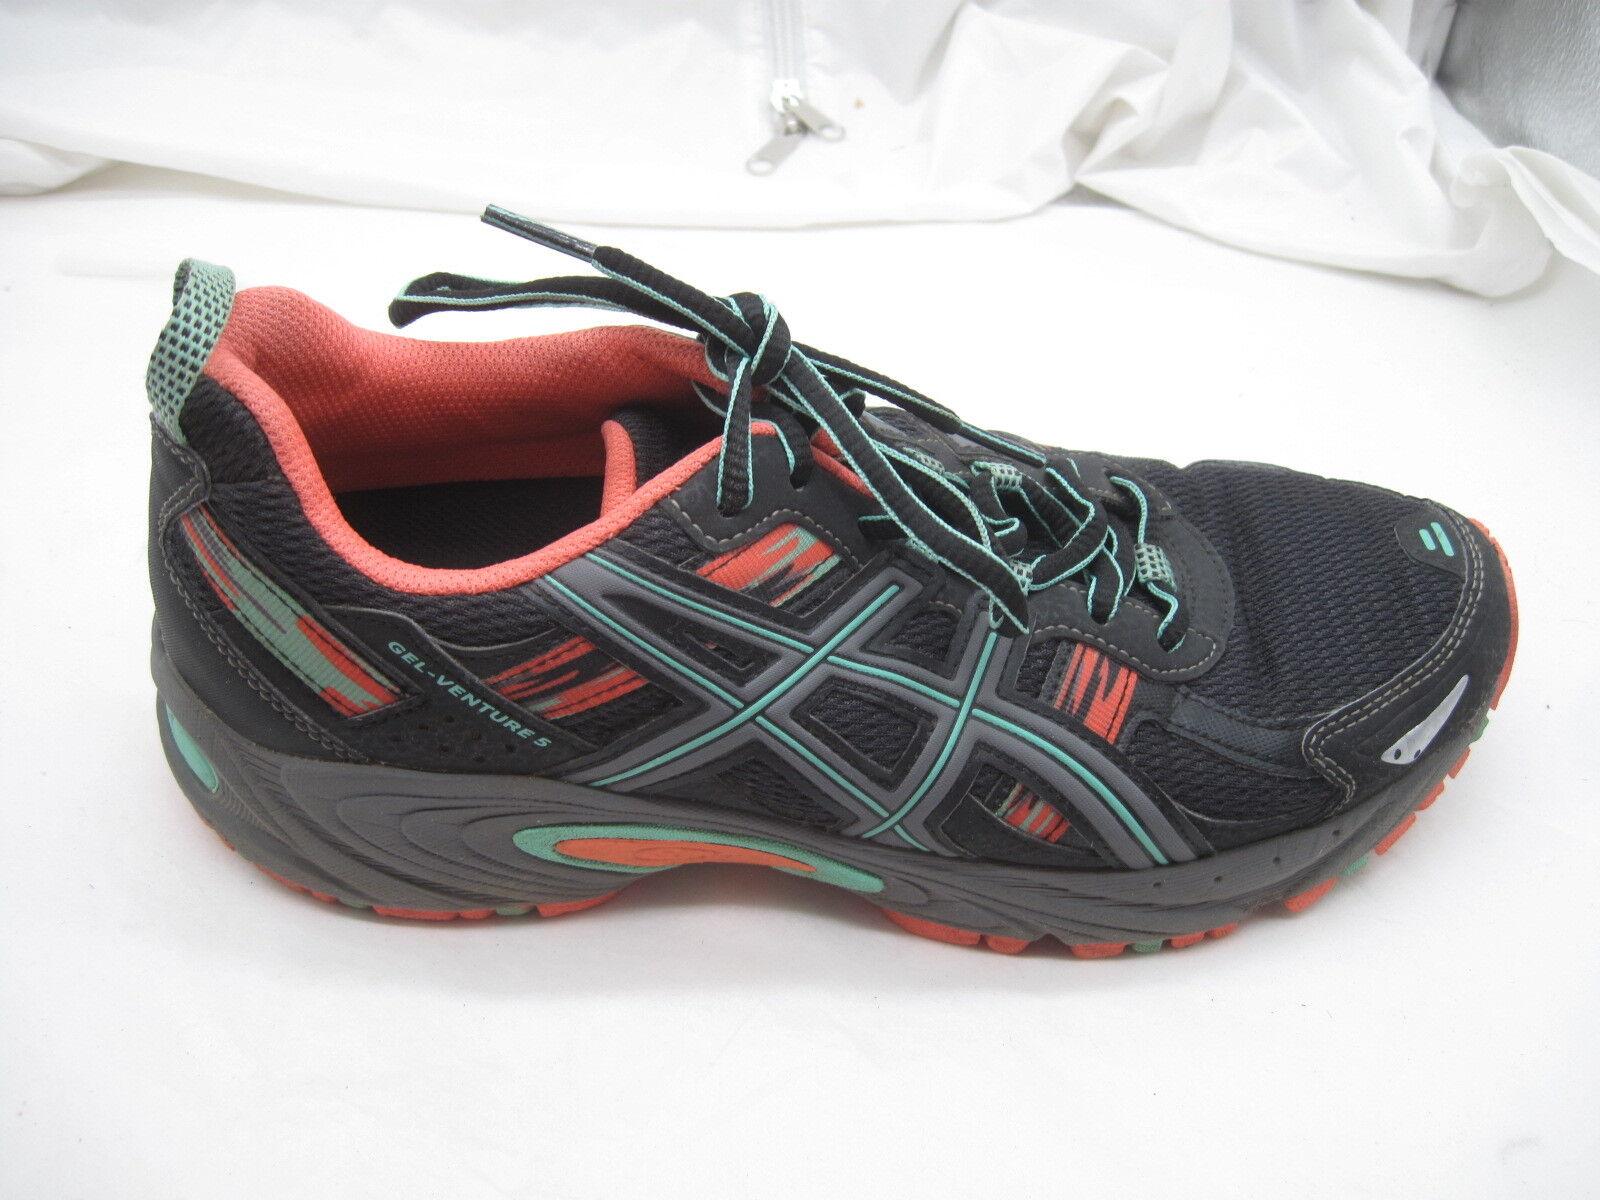 Asics size 9M Gel-Venture 5 black mint womens ladies running sneakers shoes Cheap women's shoes women's shoes